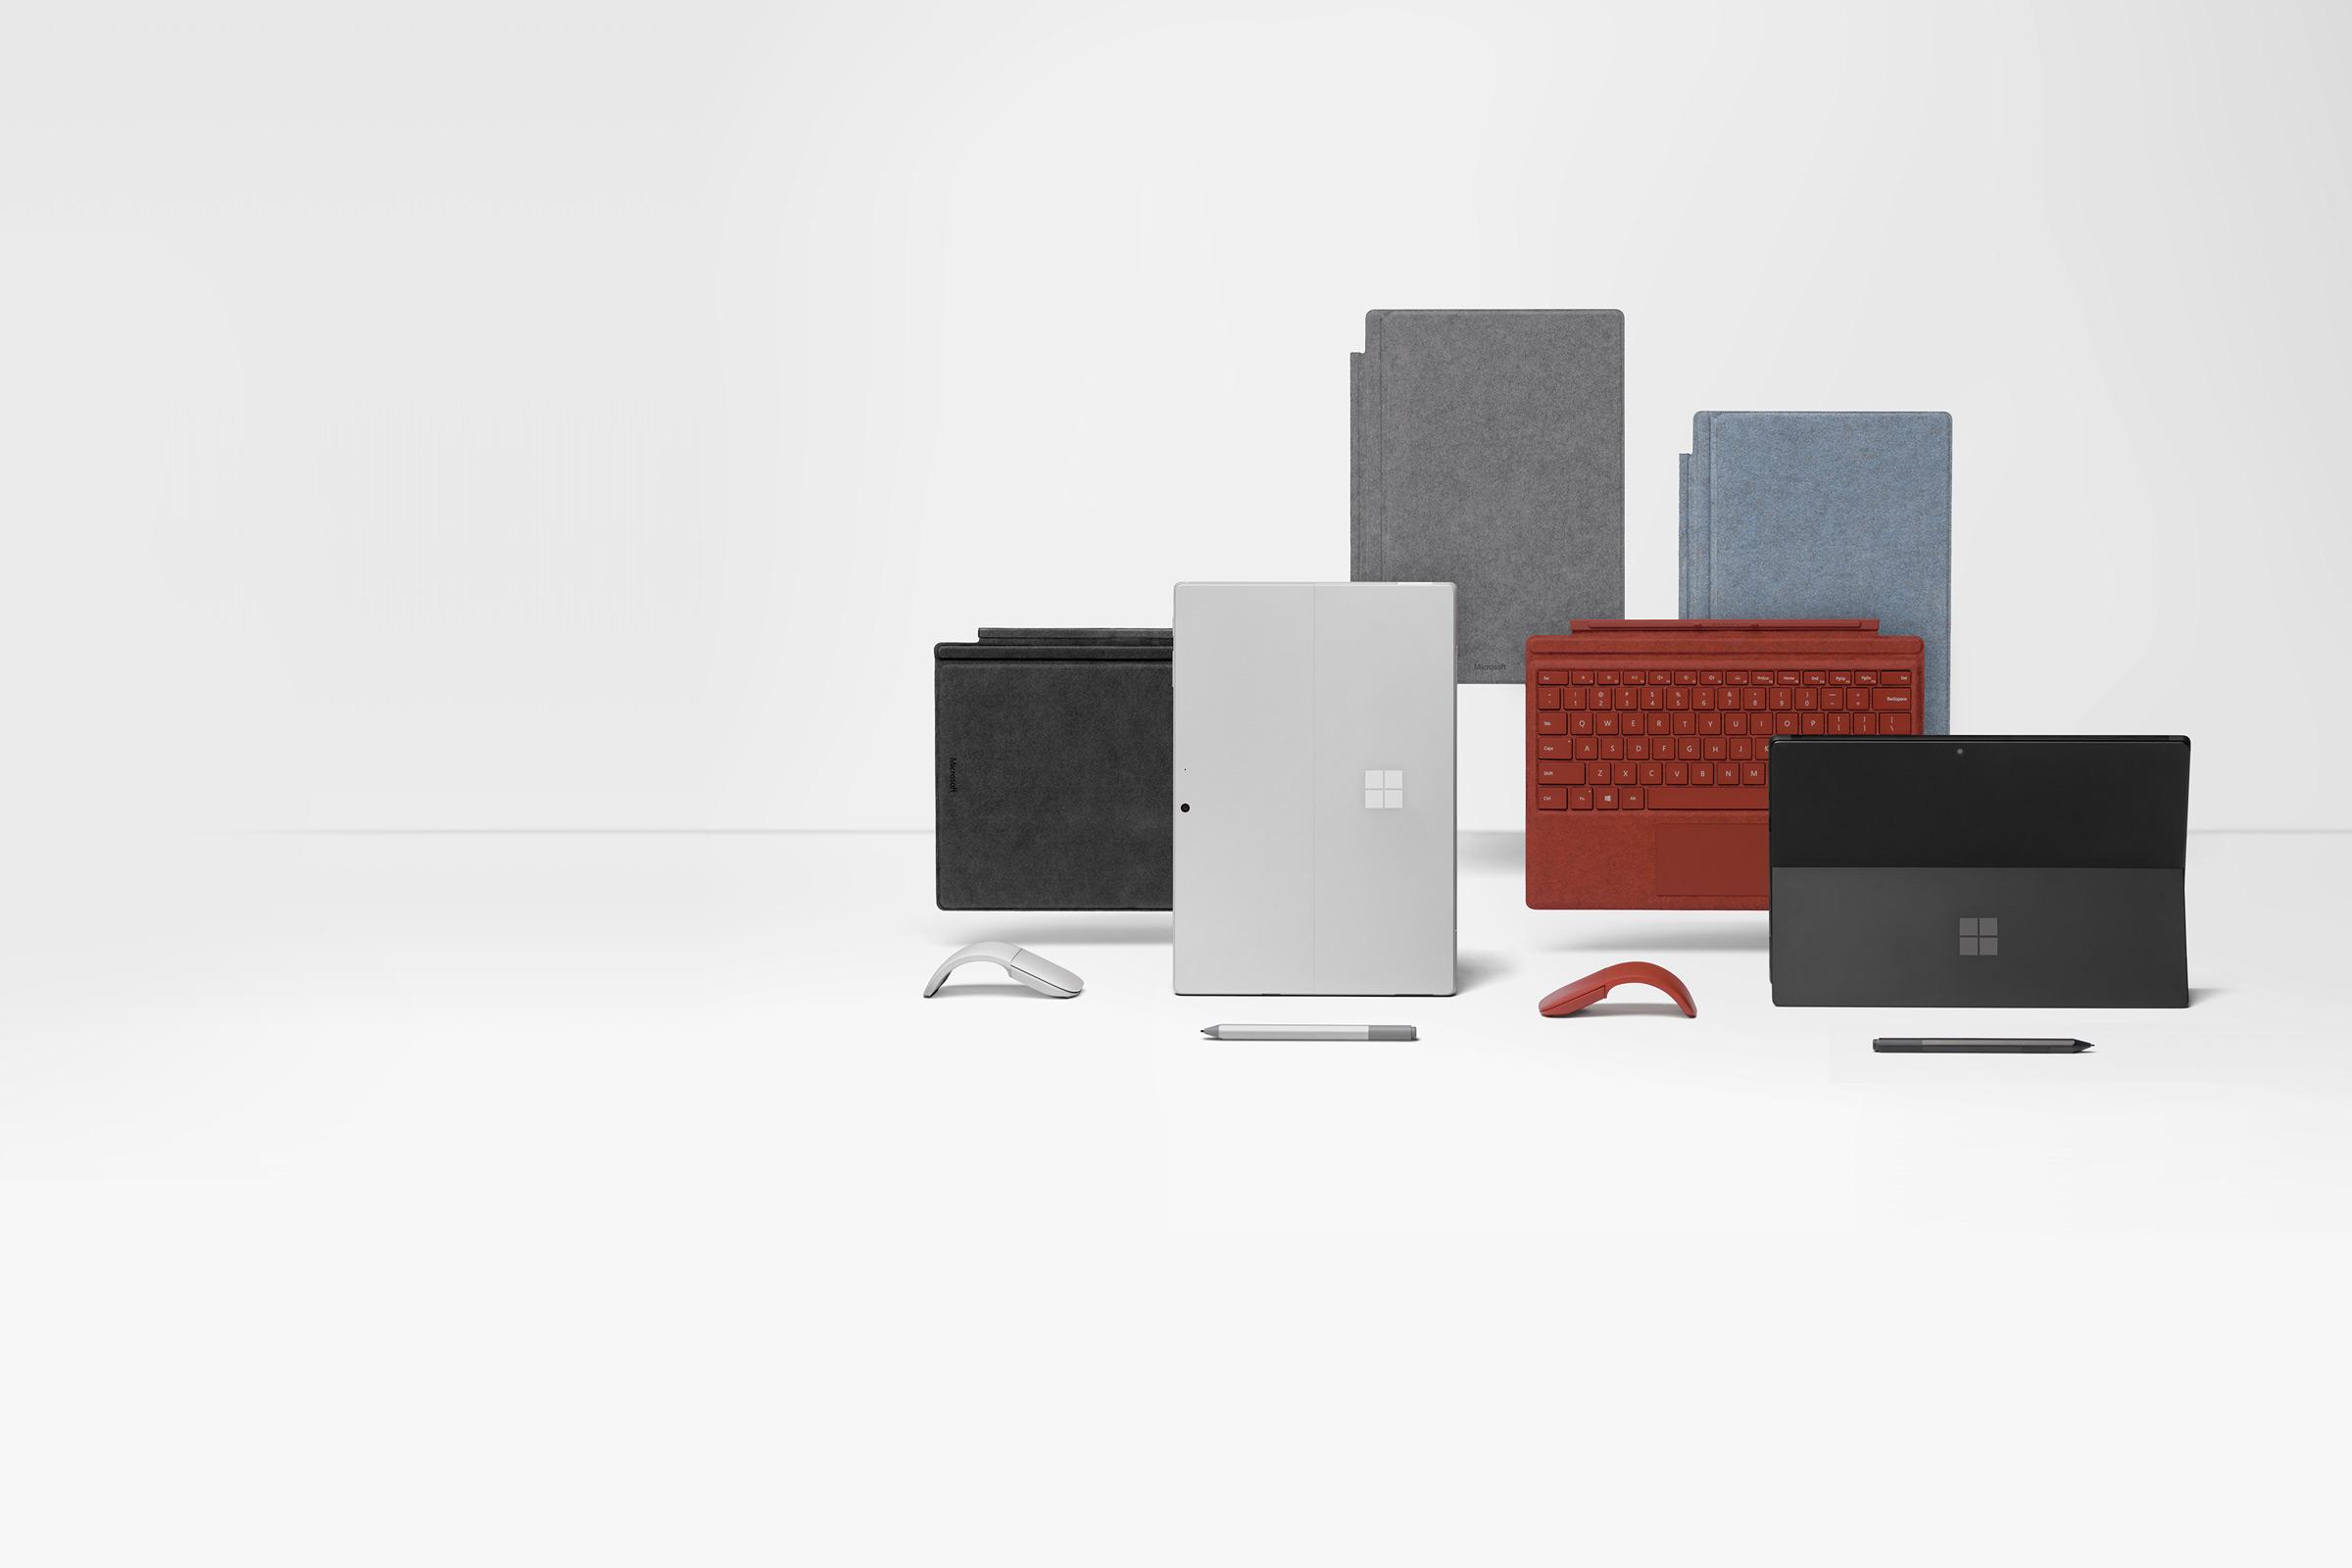 Surface Pro 7 Ultra Light And Versatile Microsoft Surface